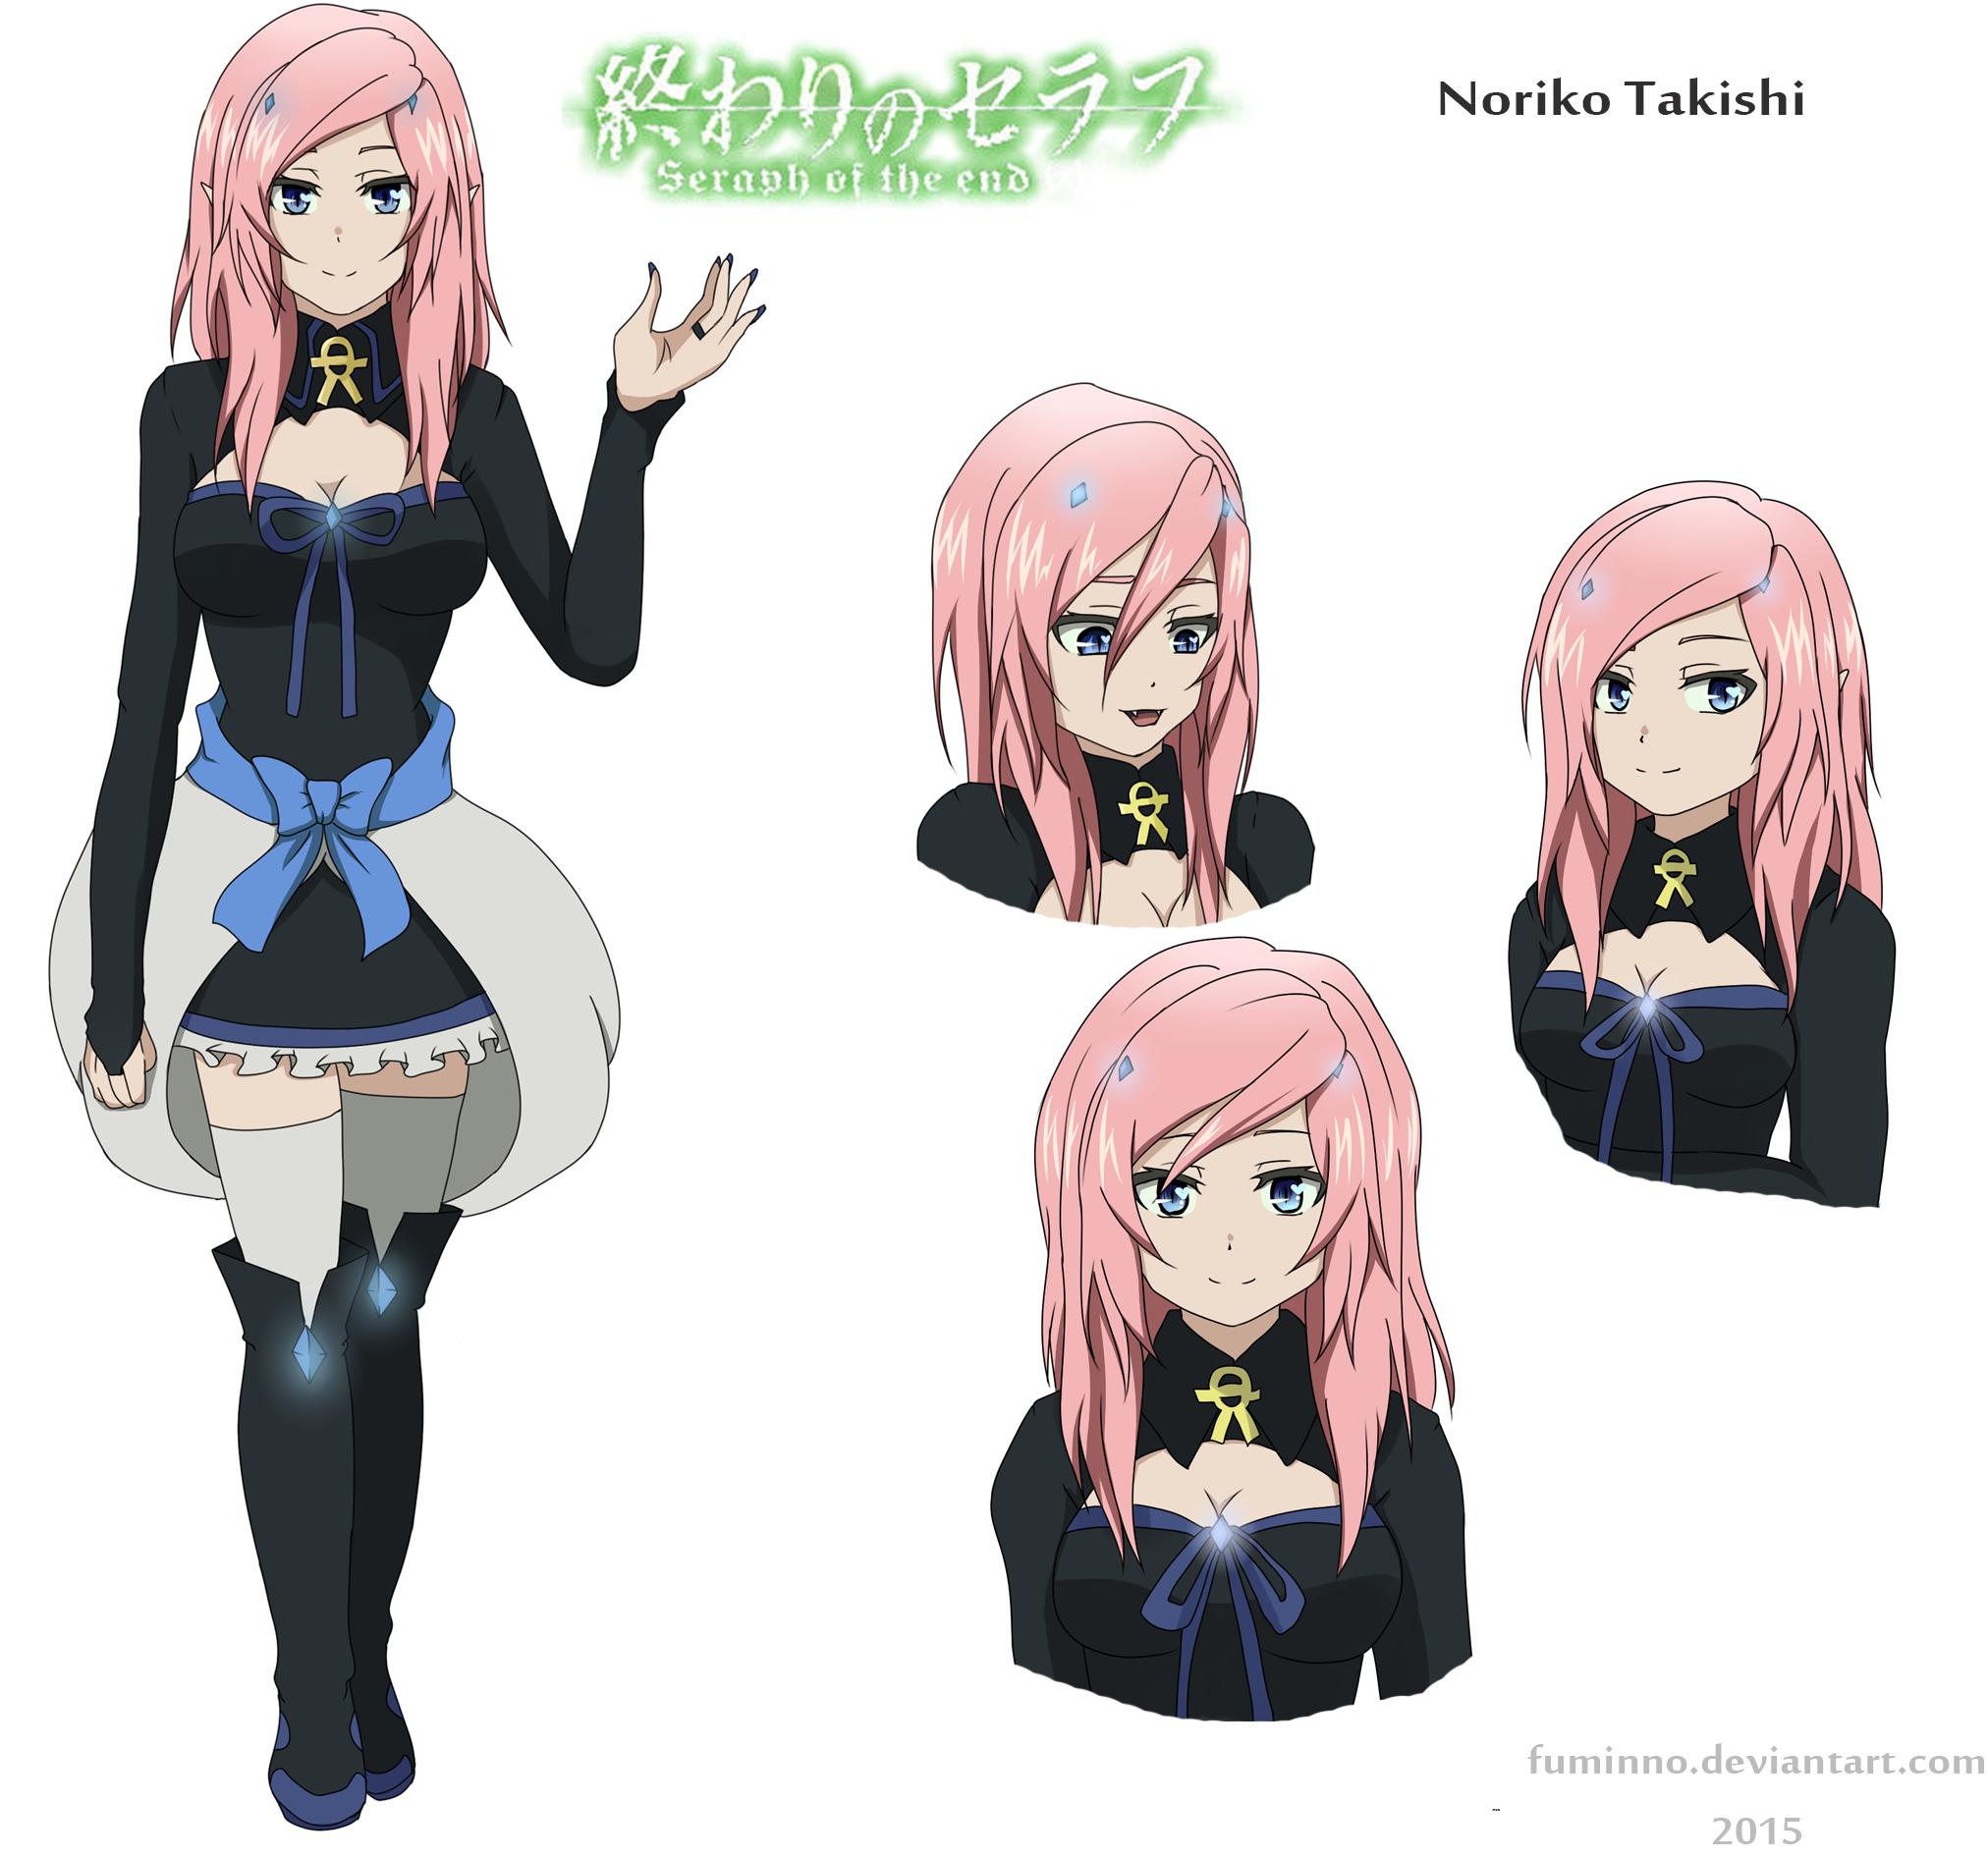 Takishi Noriko OC RPC Owari No Seraph By Fuminno On